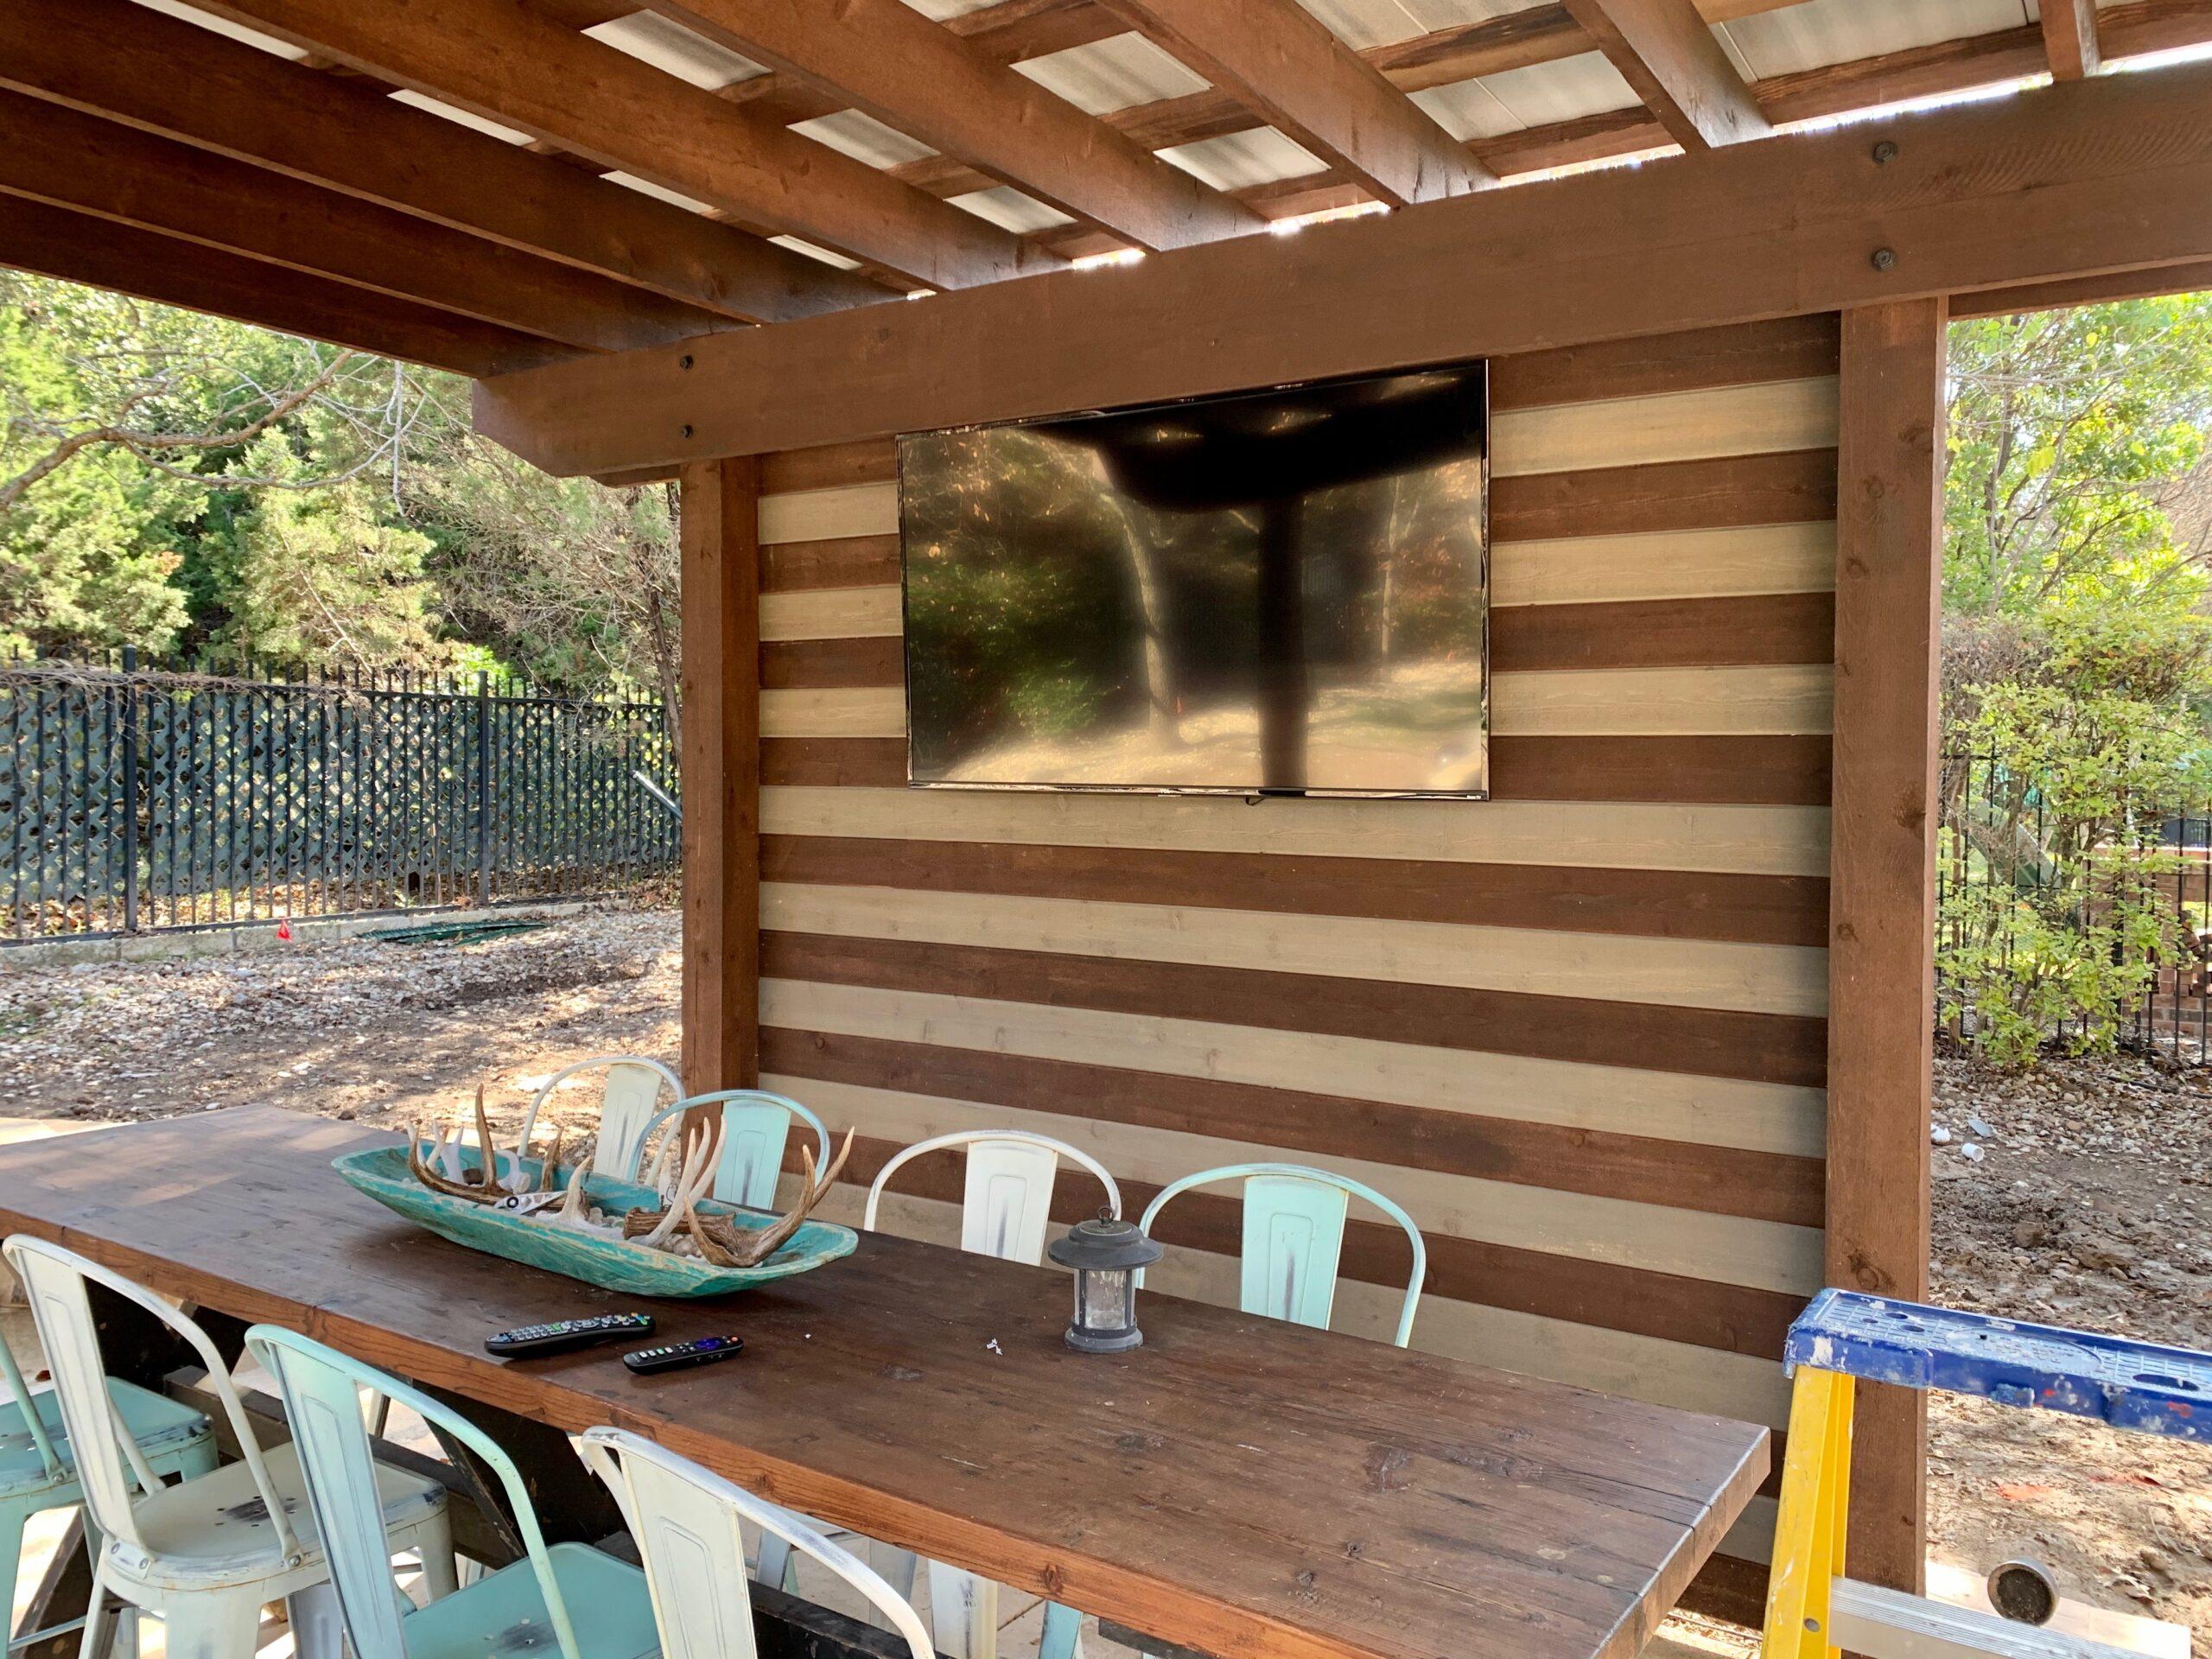 Outdoor Samsung framed TV mounted